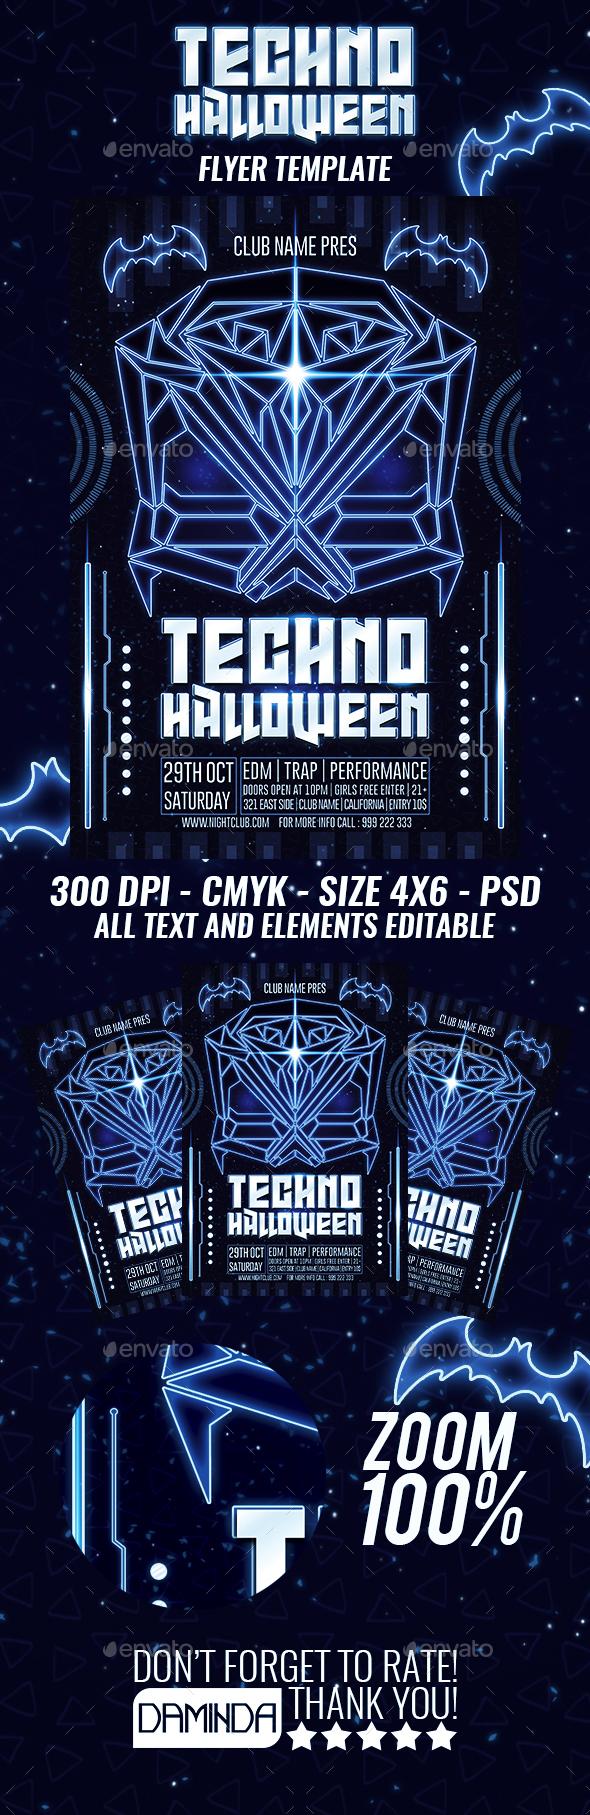 Techno Halloween Flyer Template By Daminda Design Graphicriver